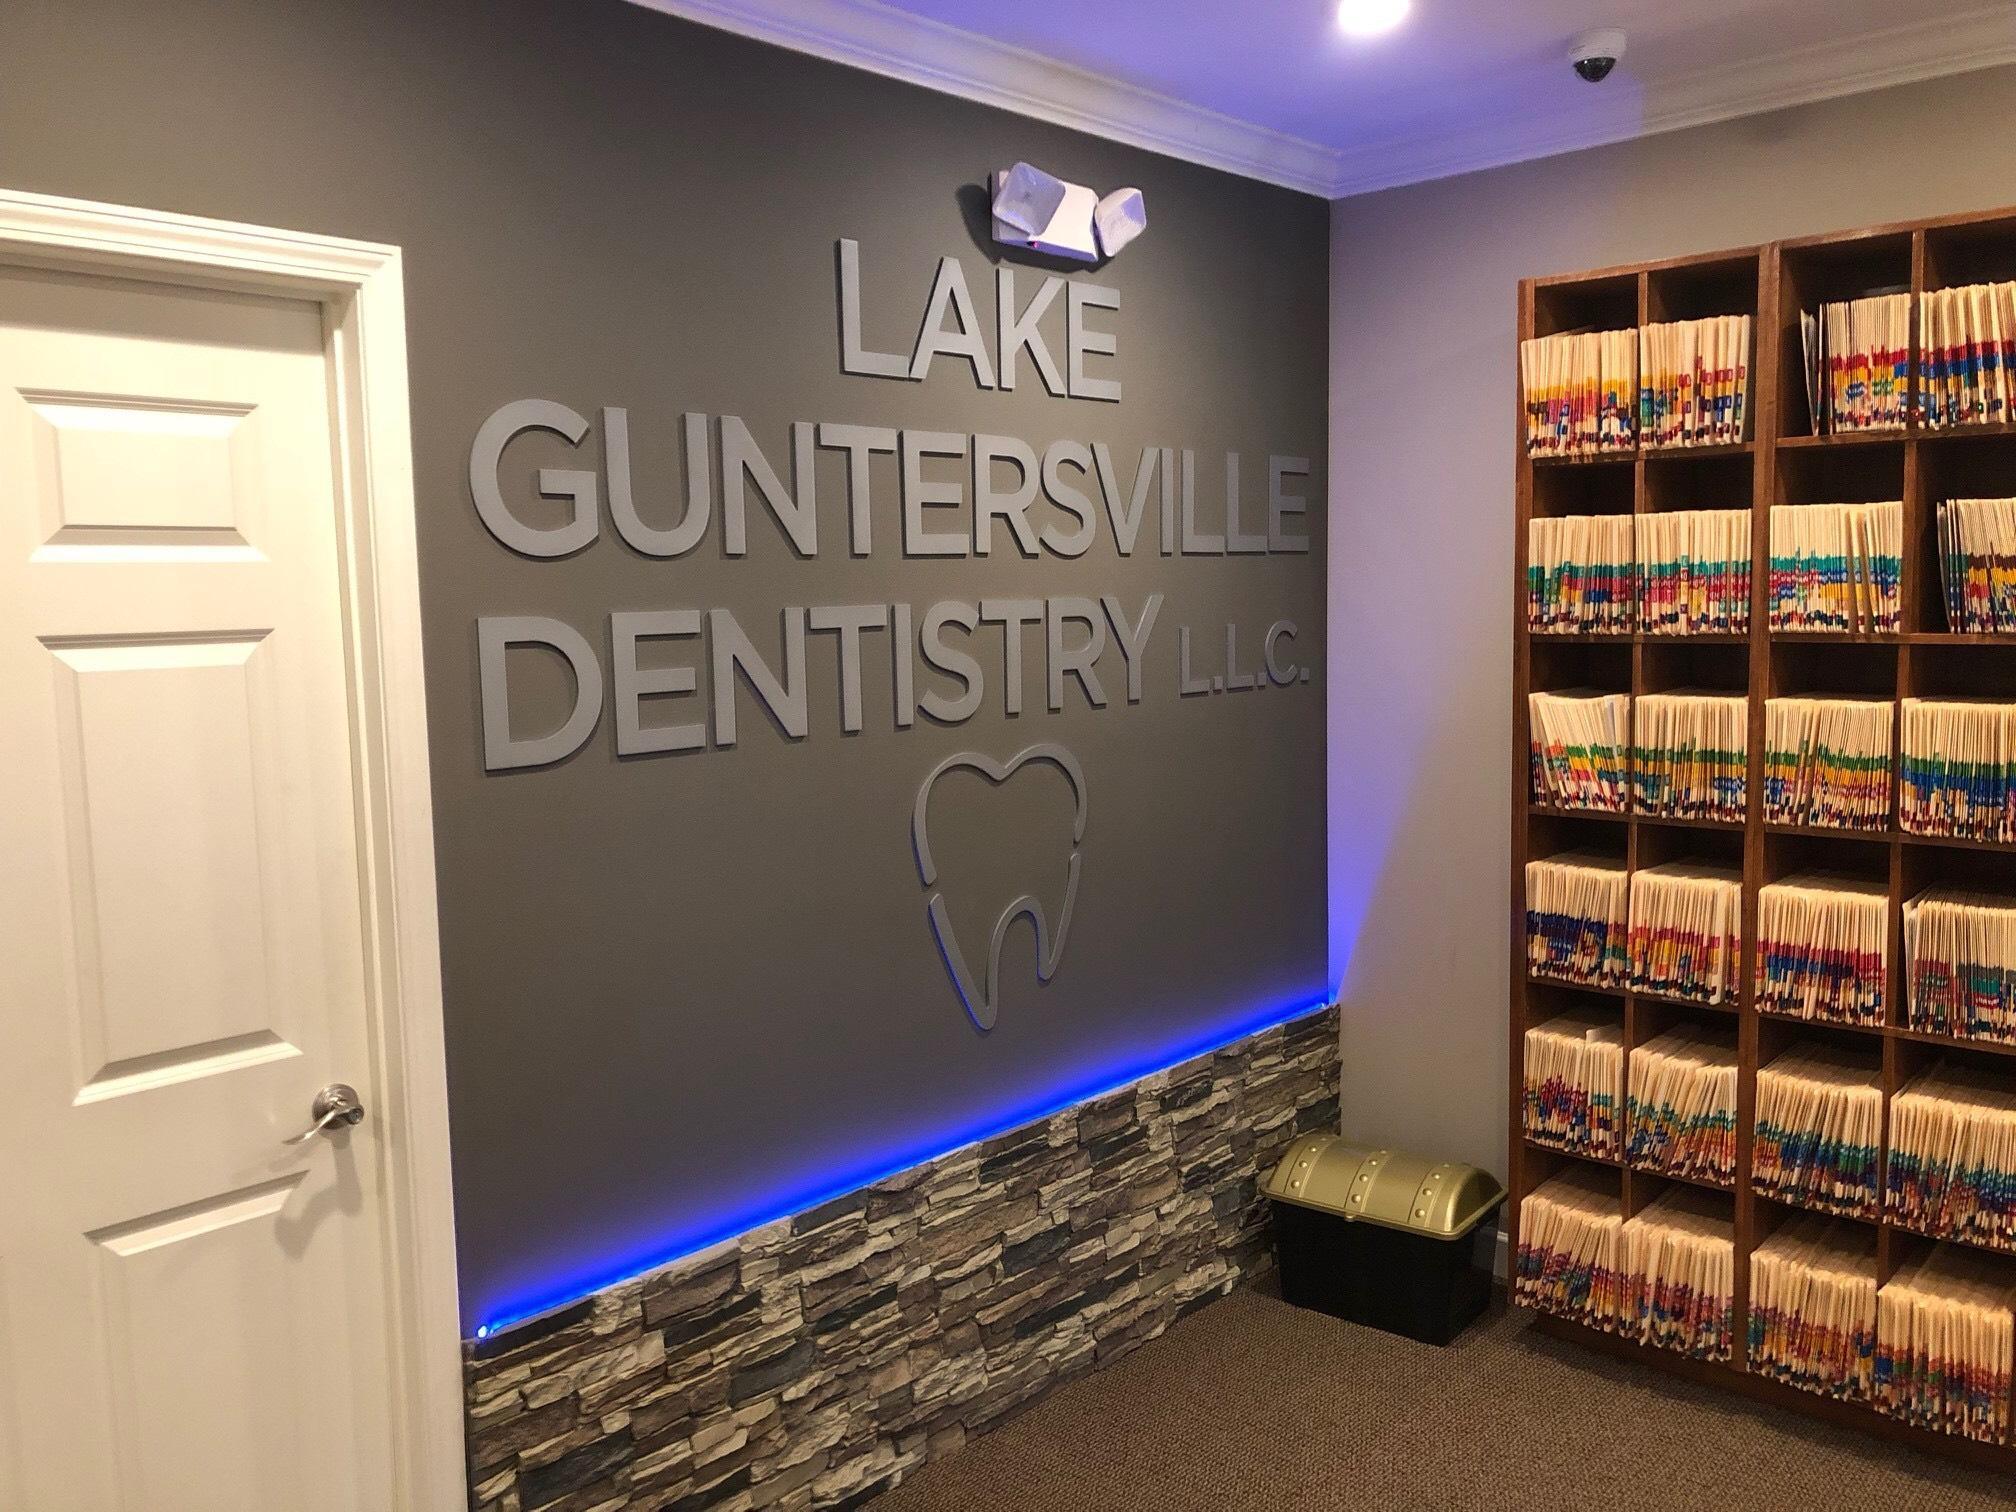 Lake Guntersville Dentistry image 1